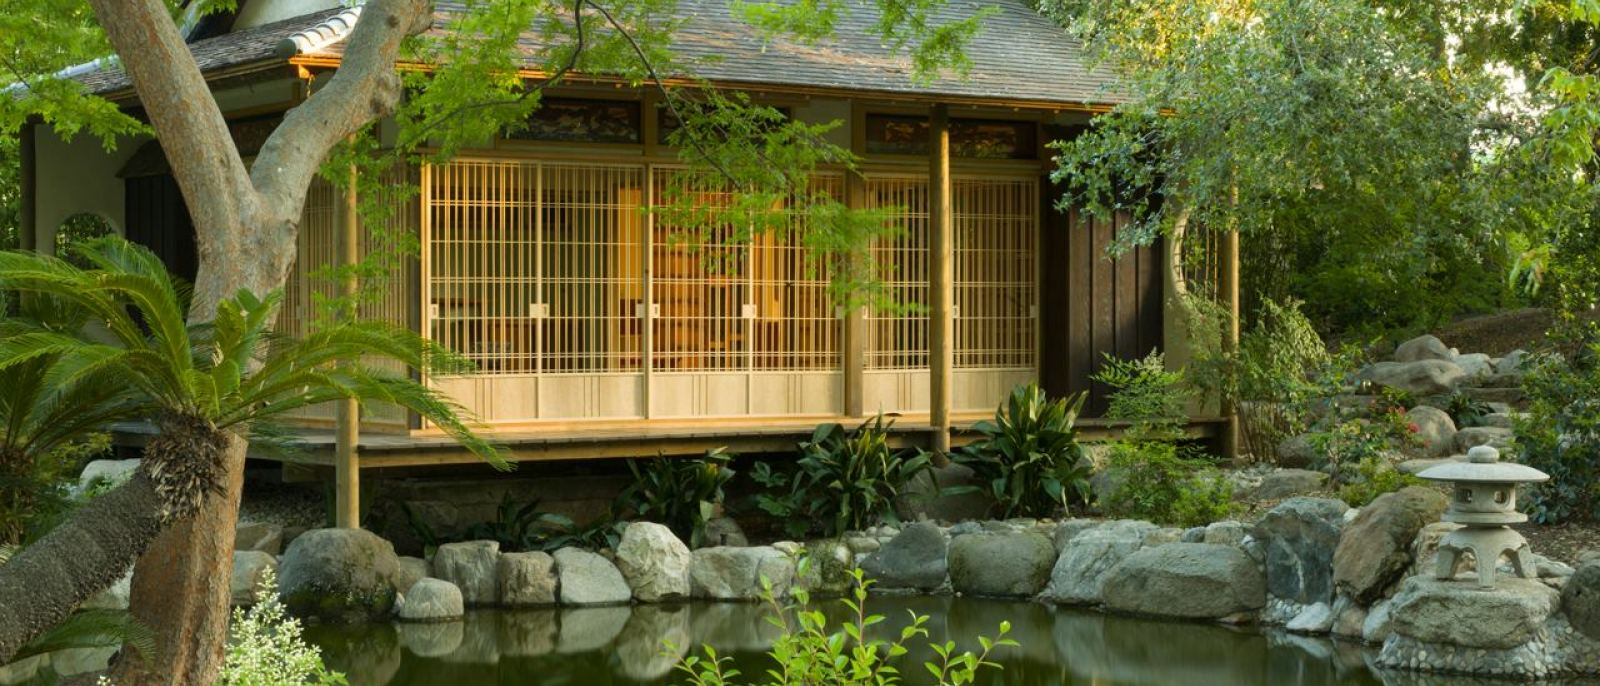 Storrier Stearns Japanese Garden teahouse